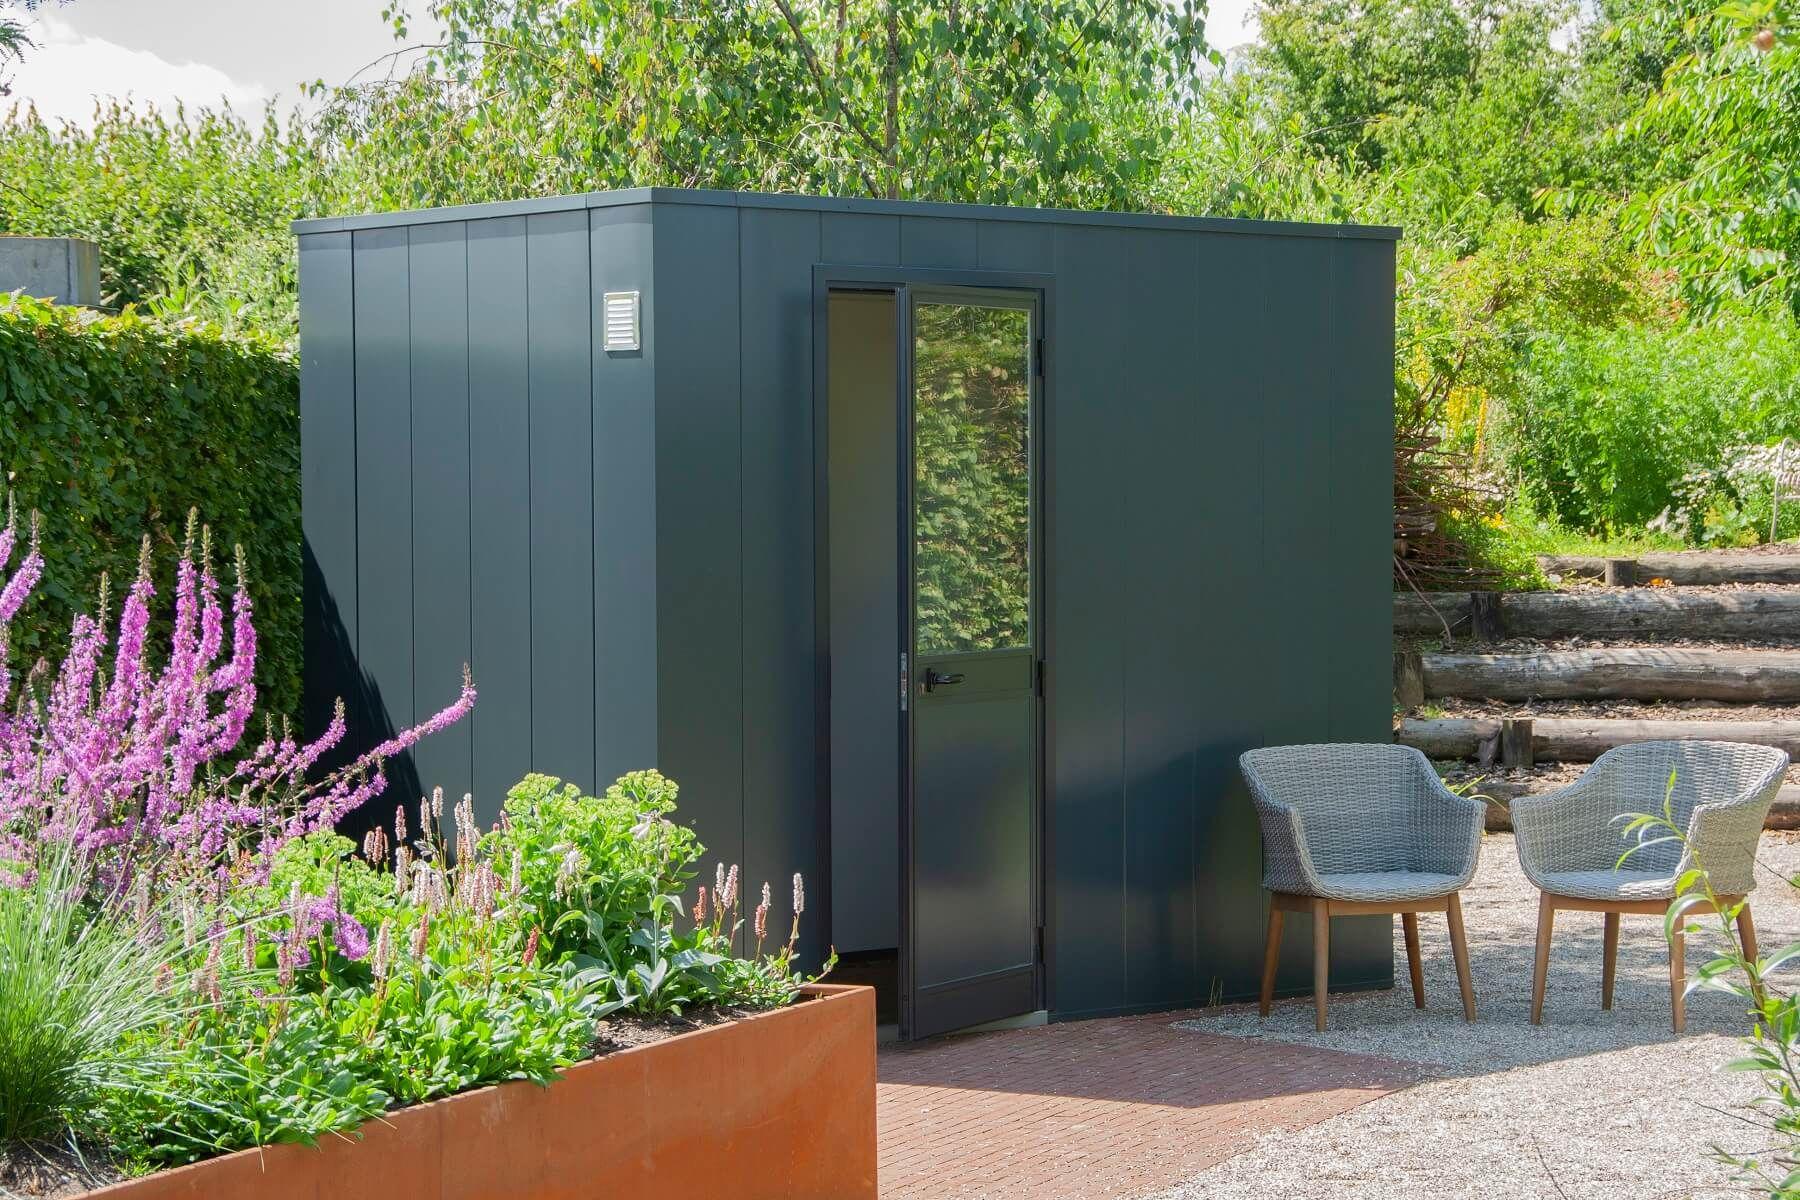 Ongekend Modern Tuinhuis kopen? Geïsoleerd + onderhoudsvrij in 2020 AJ-83